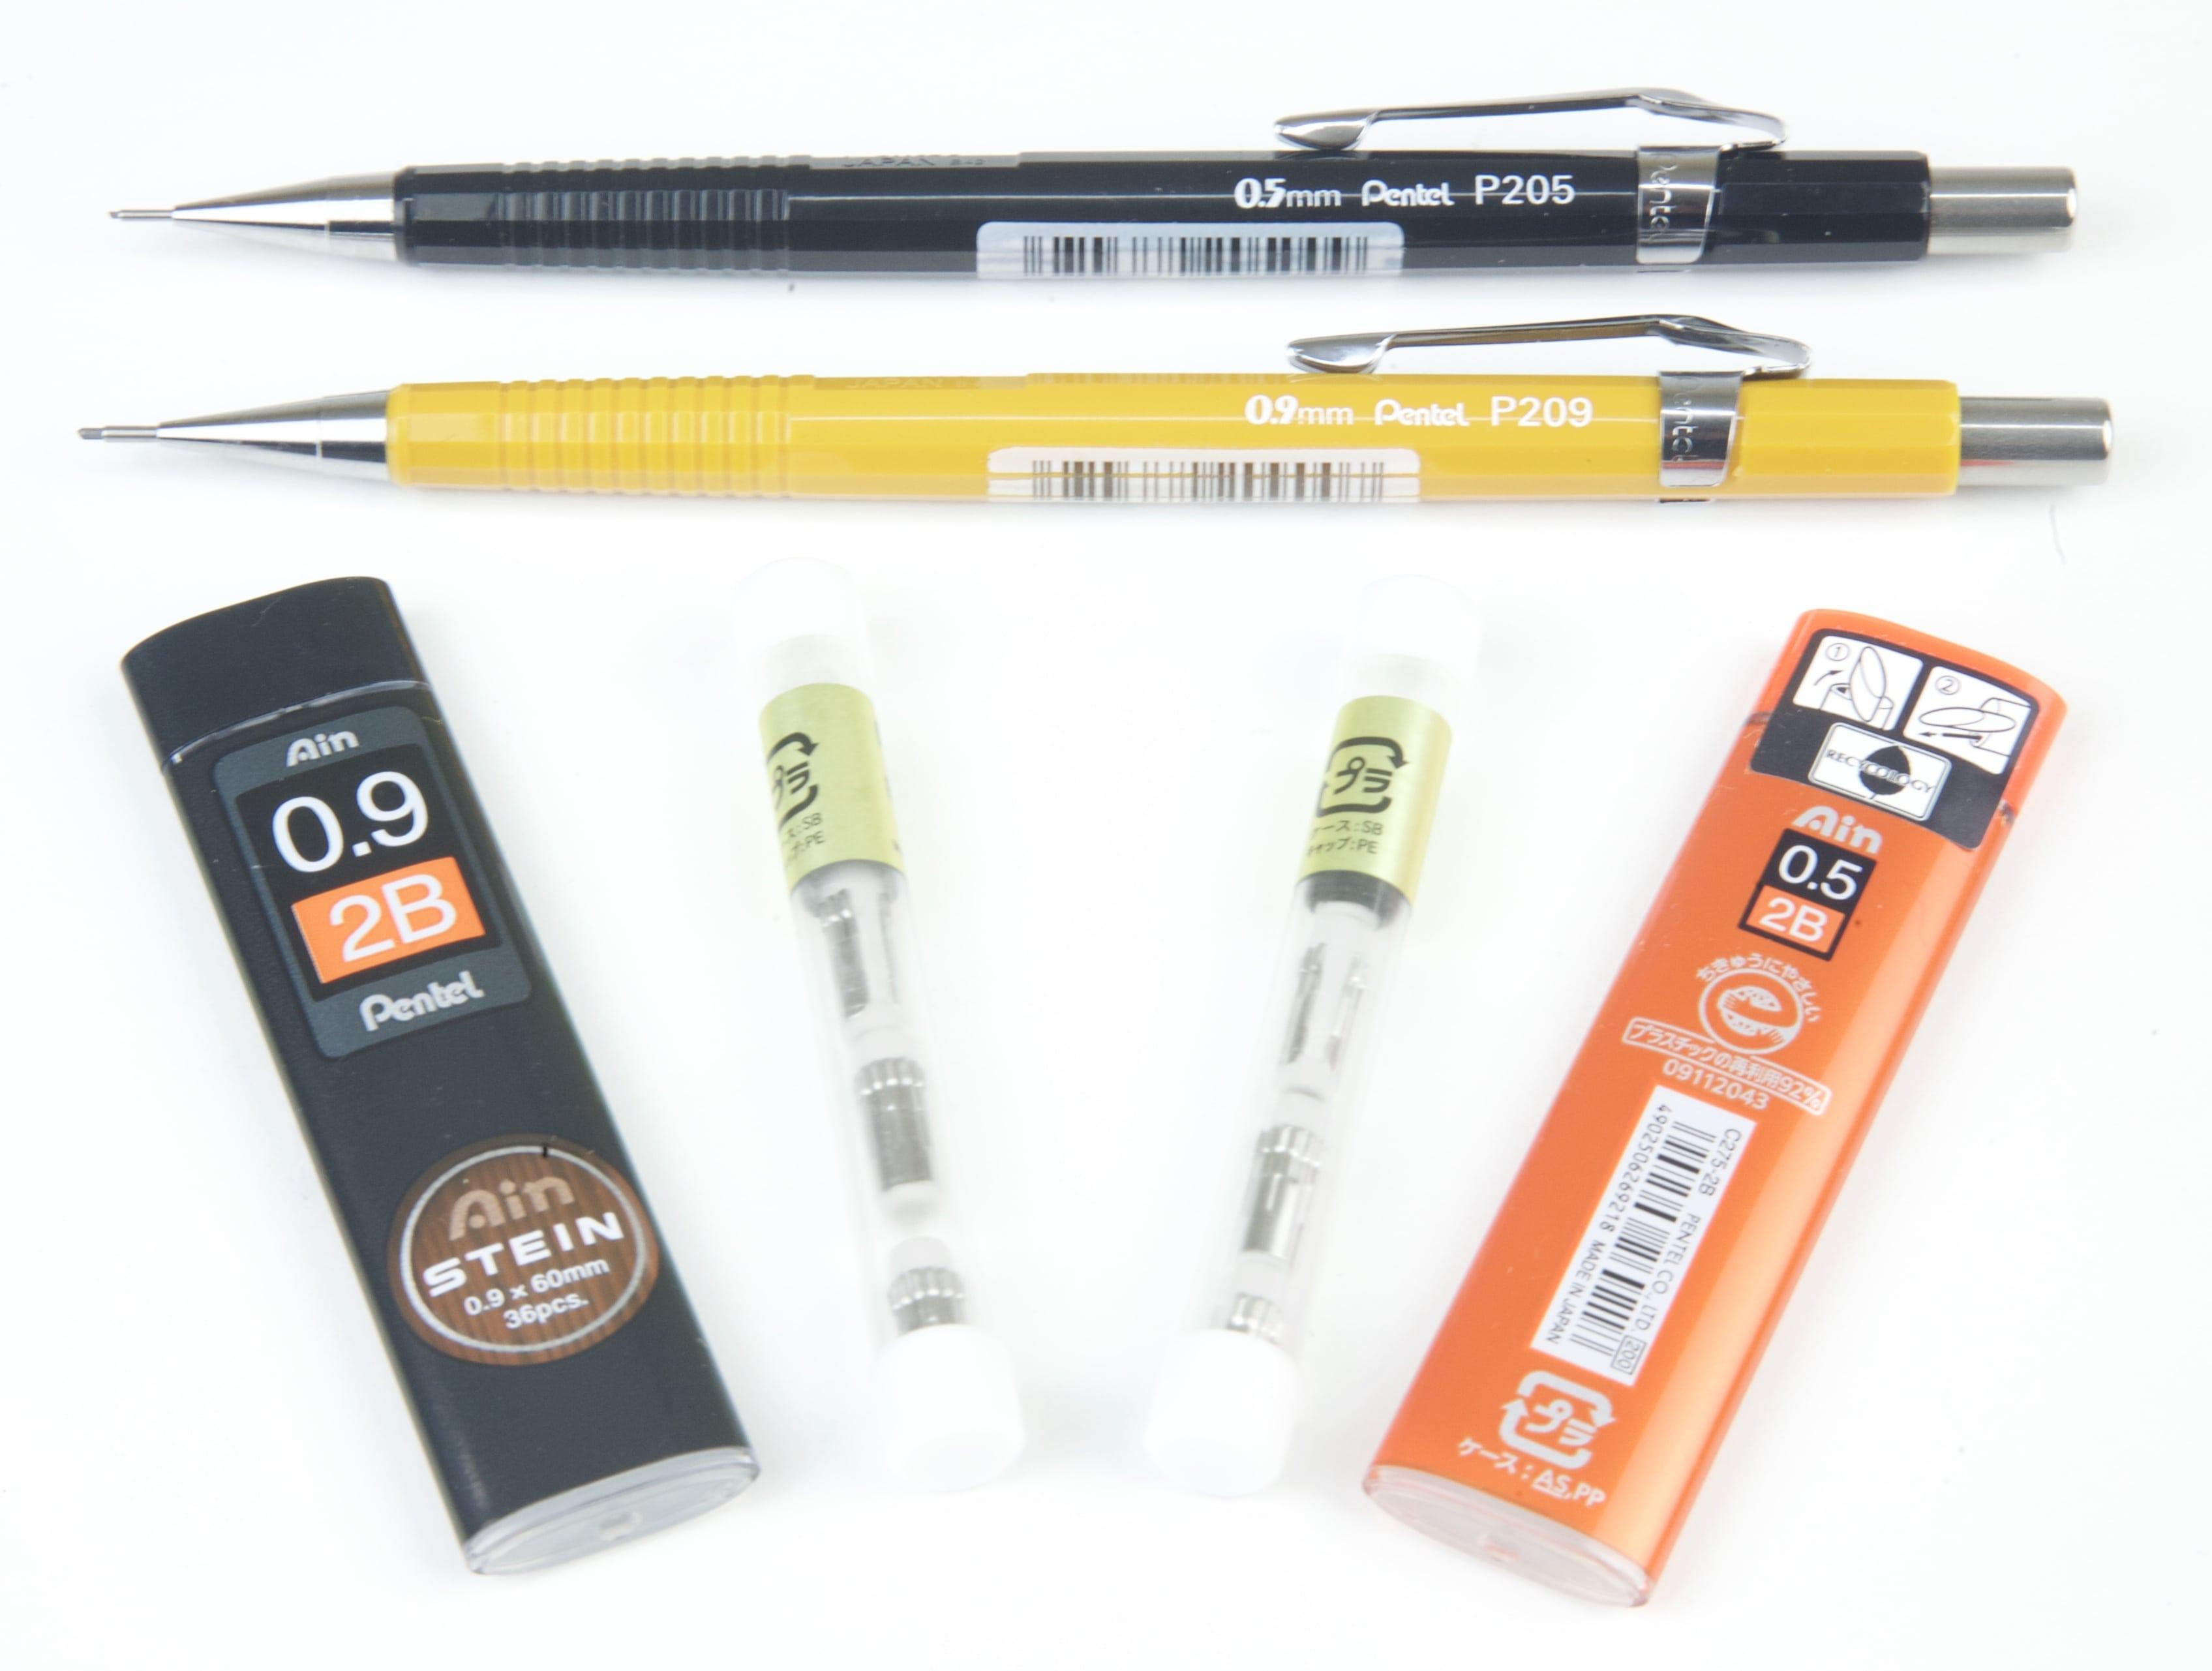 Pentel Mechanical Pencils & Accessories